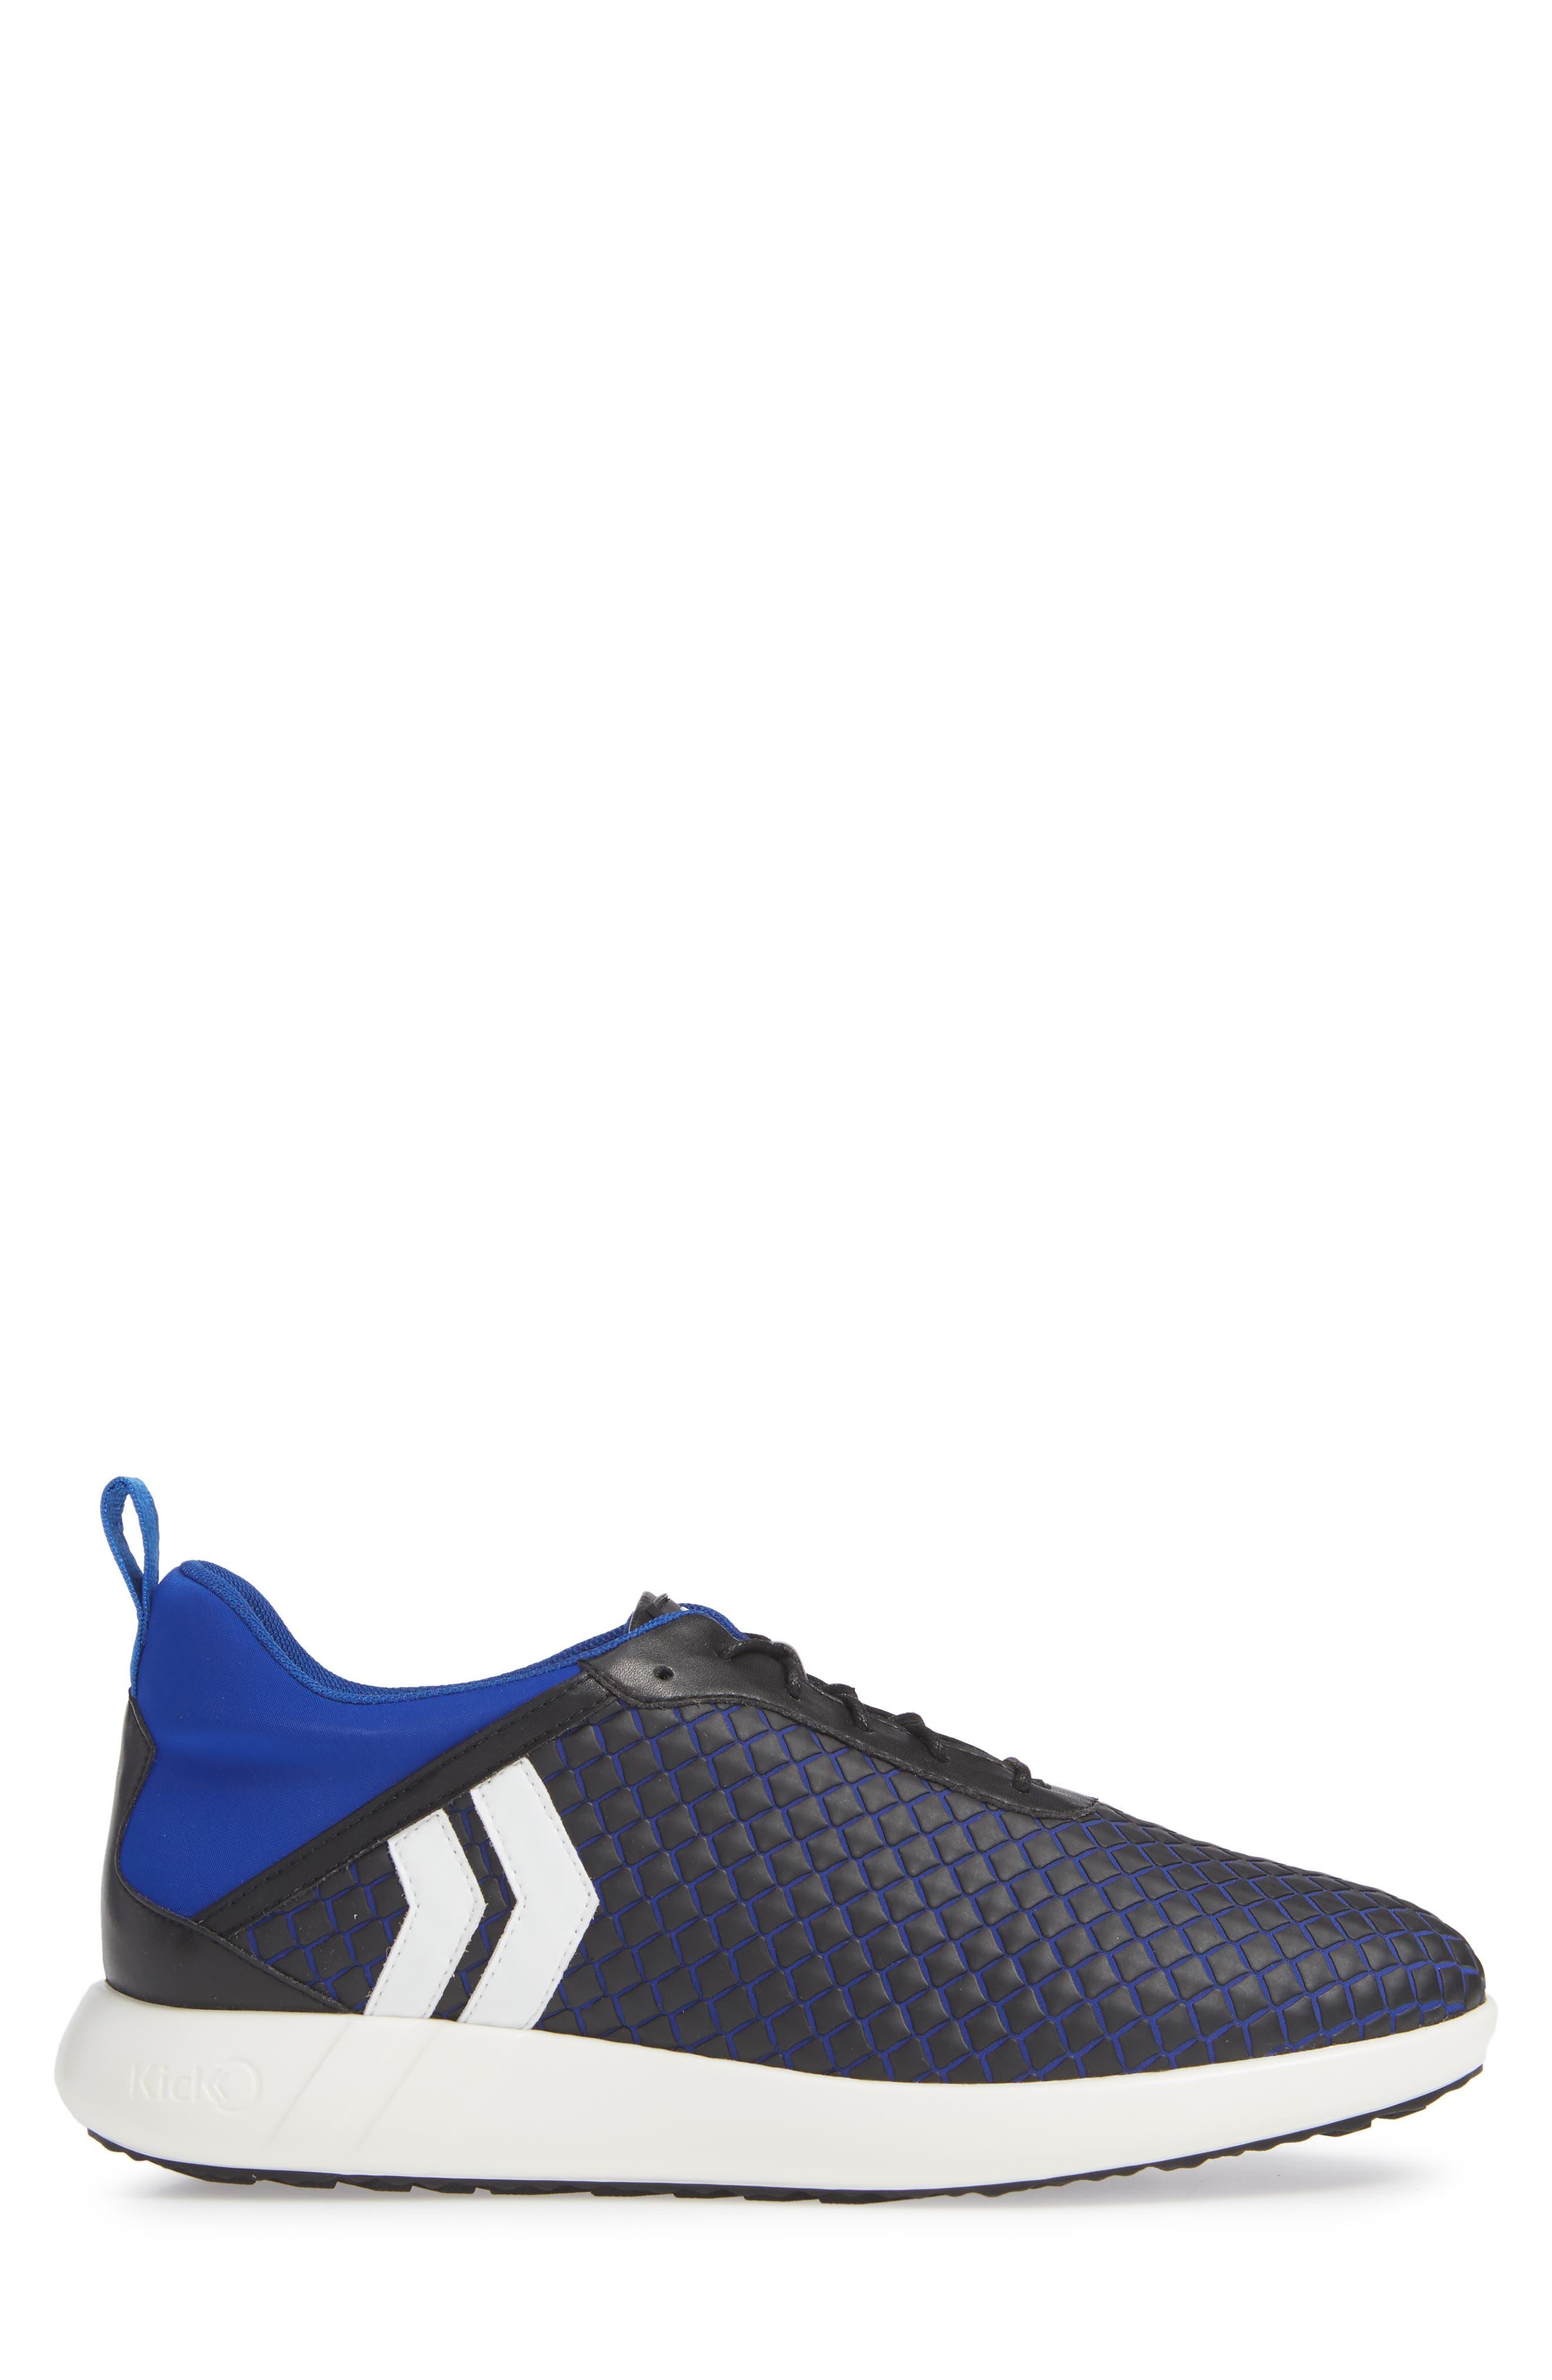 Onyx Sneaker,                             Alternate thumbnail 3, color,                             430